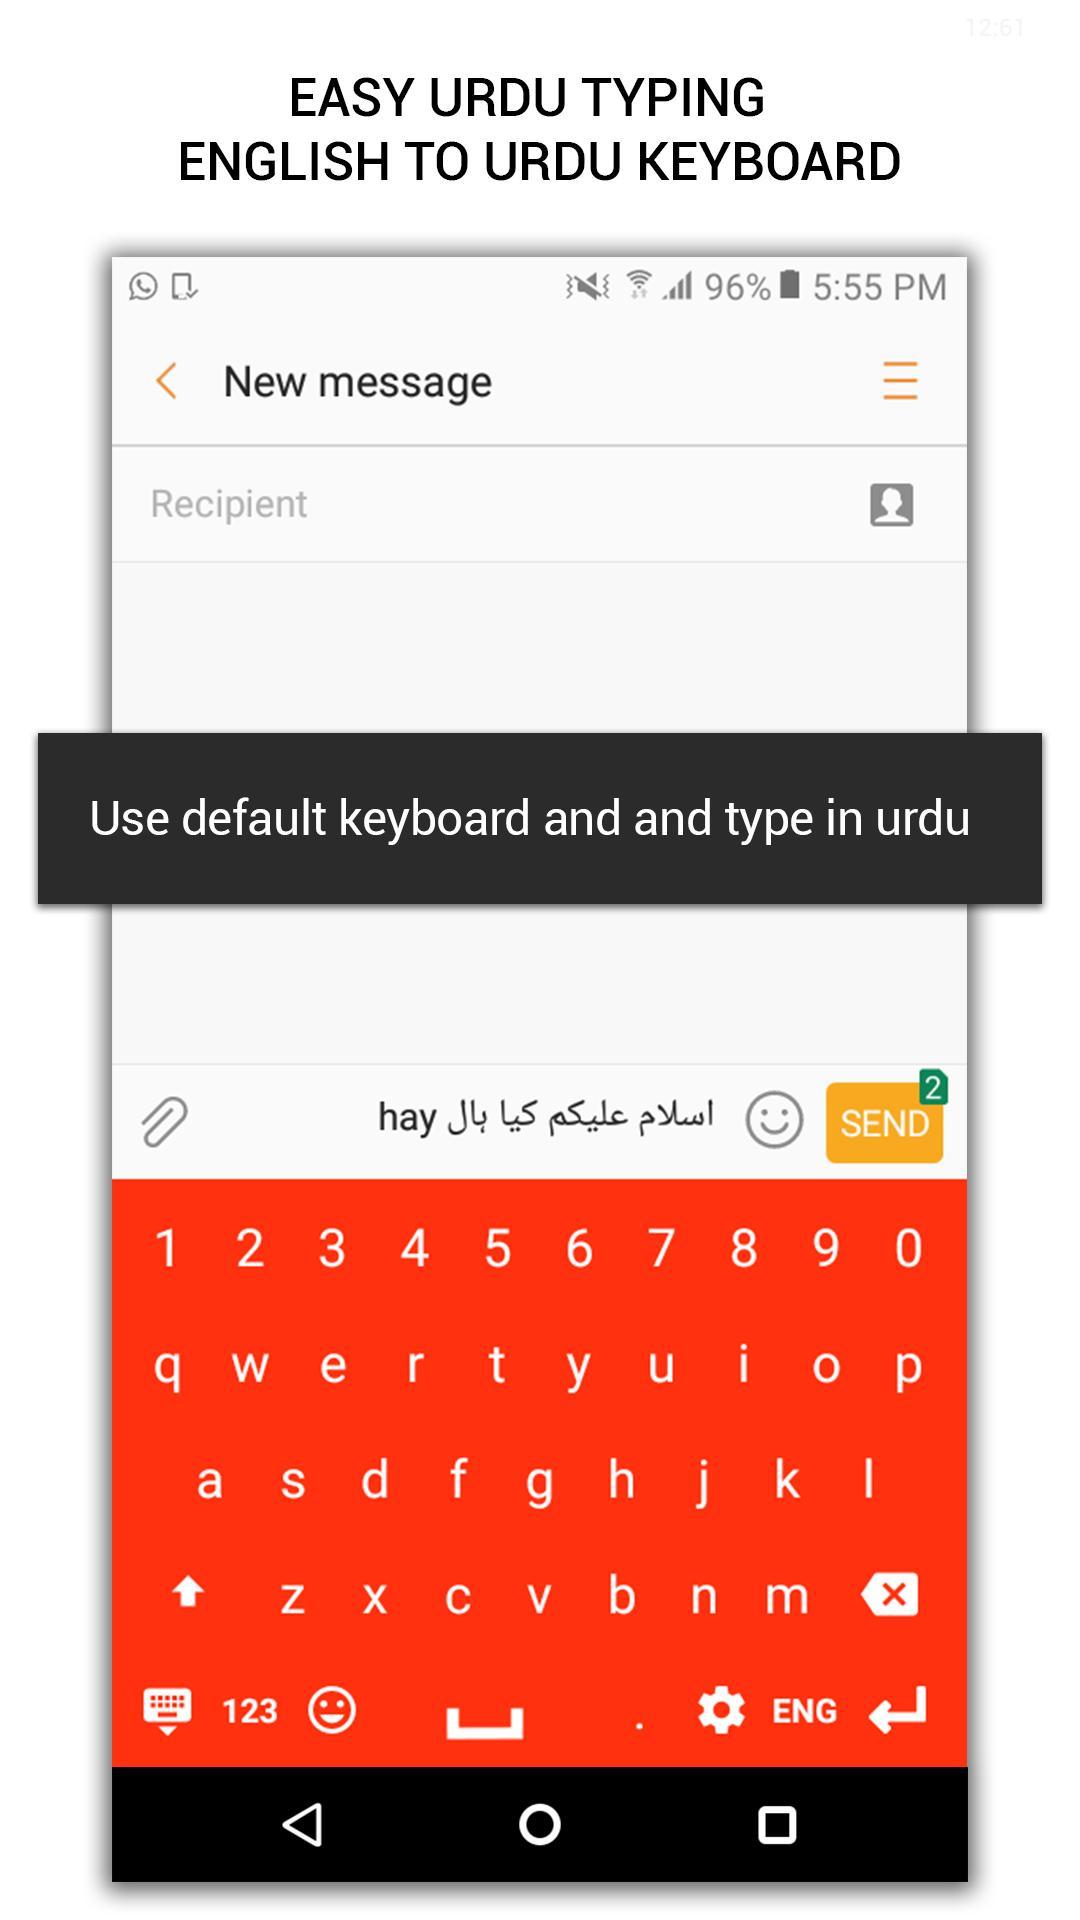 Easy Urdu Typing - English to urdu Keyboard for Android